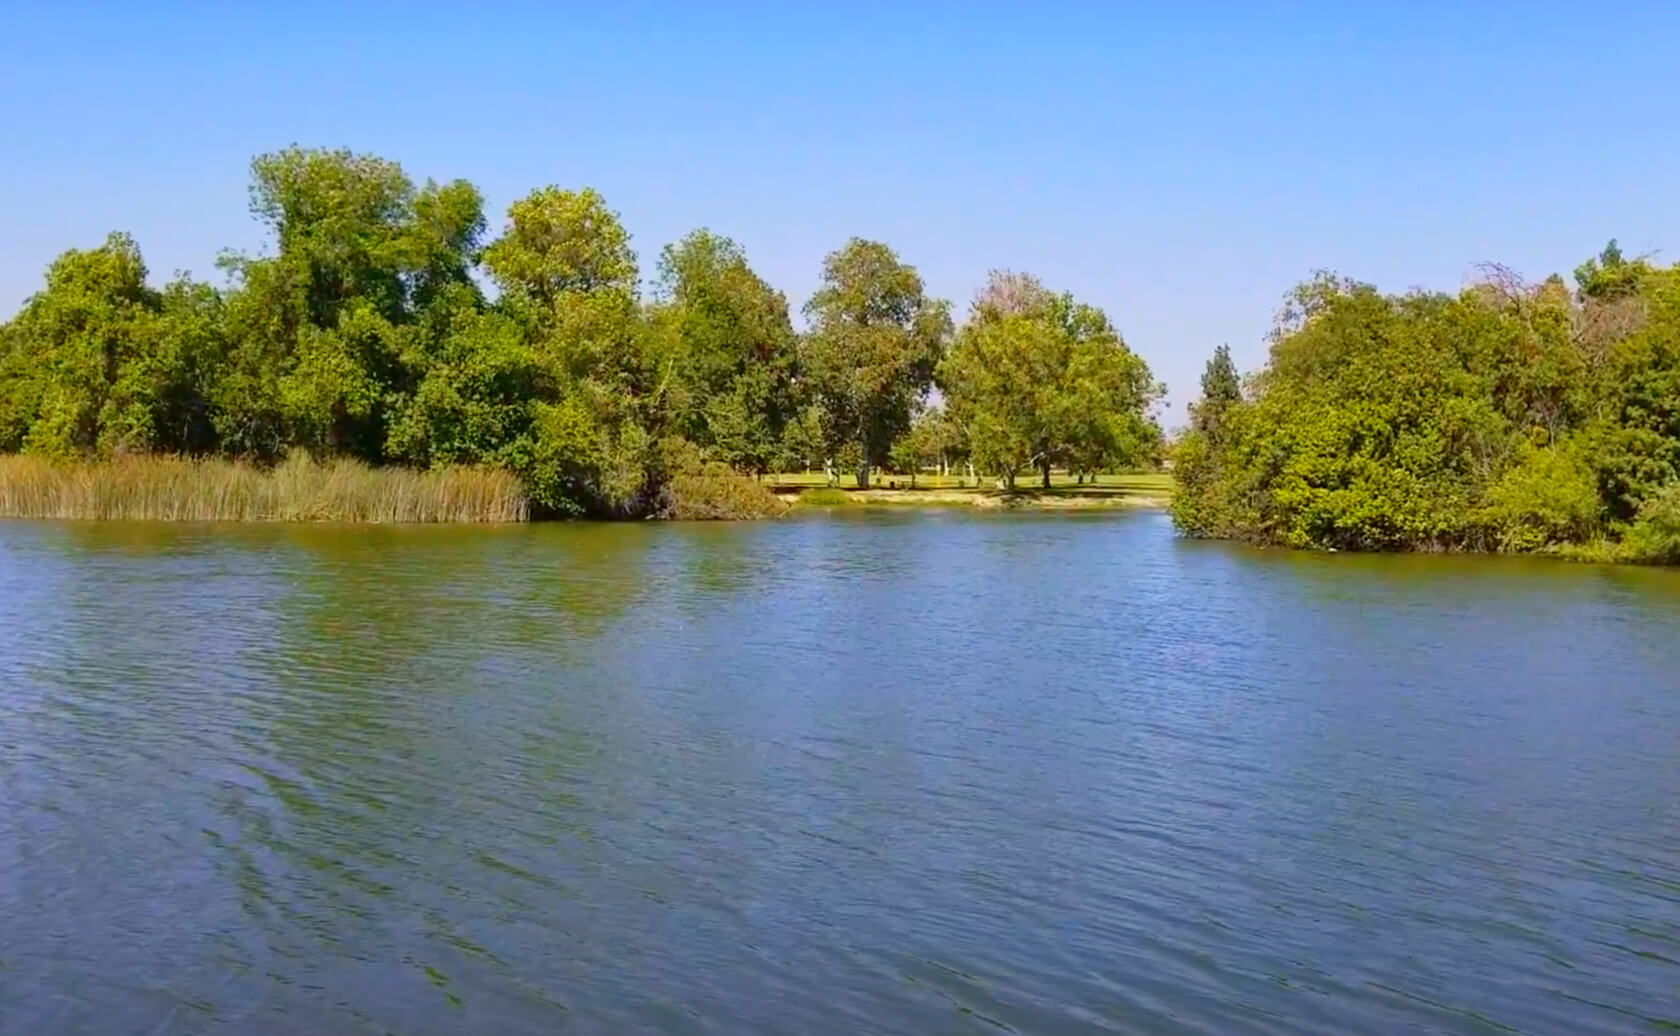 Legg-Lake-Fishing-Guide-Report-South-El-Monte-CA-91733-02